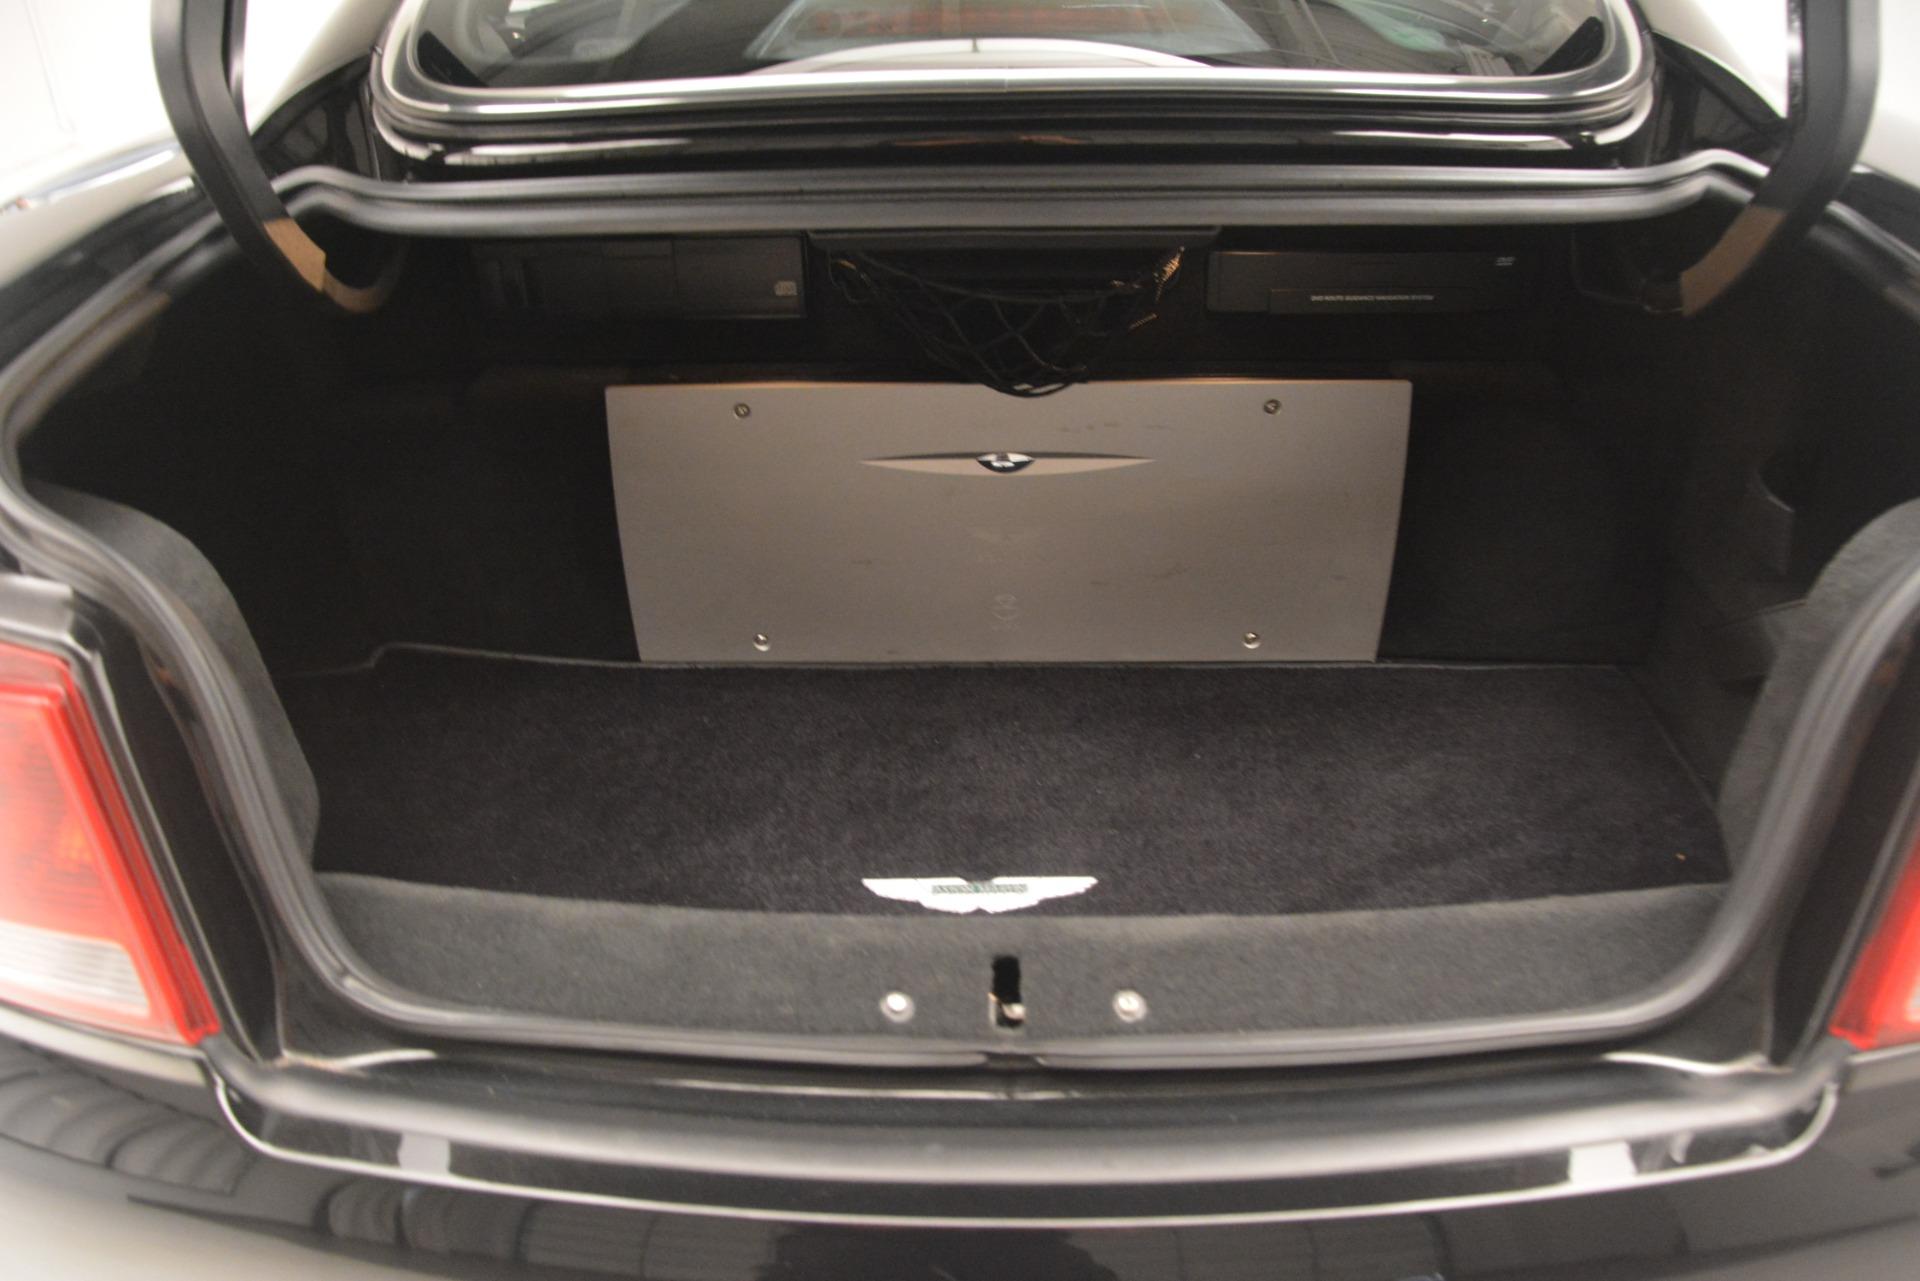 Used 2004 Aston Martin V12 Vanquish  For Sale In Greenwich, CT. Alfa Romeo of Greenwich, 7557C 3160_p16